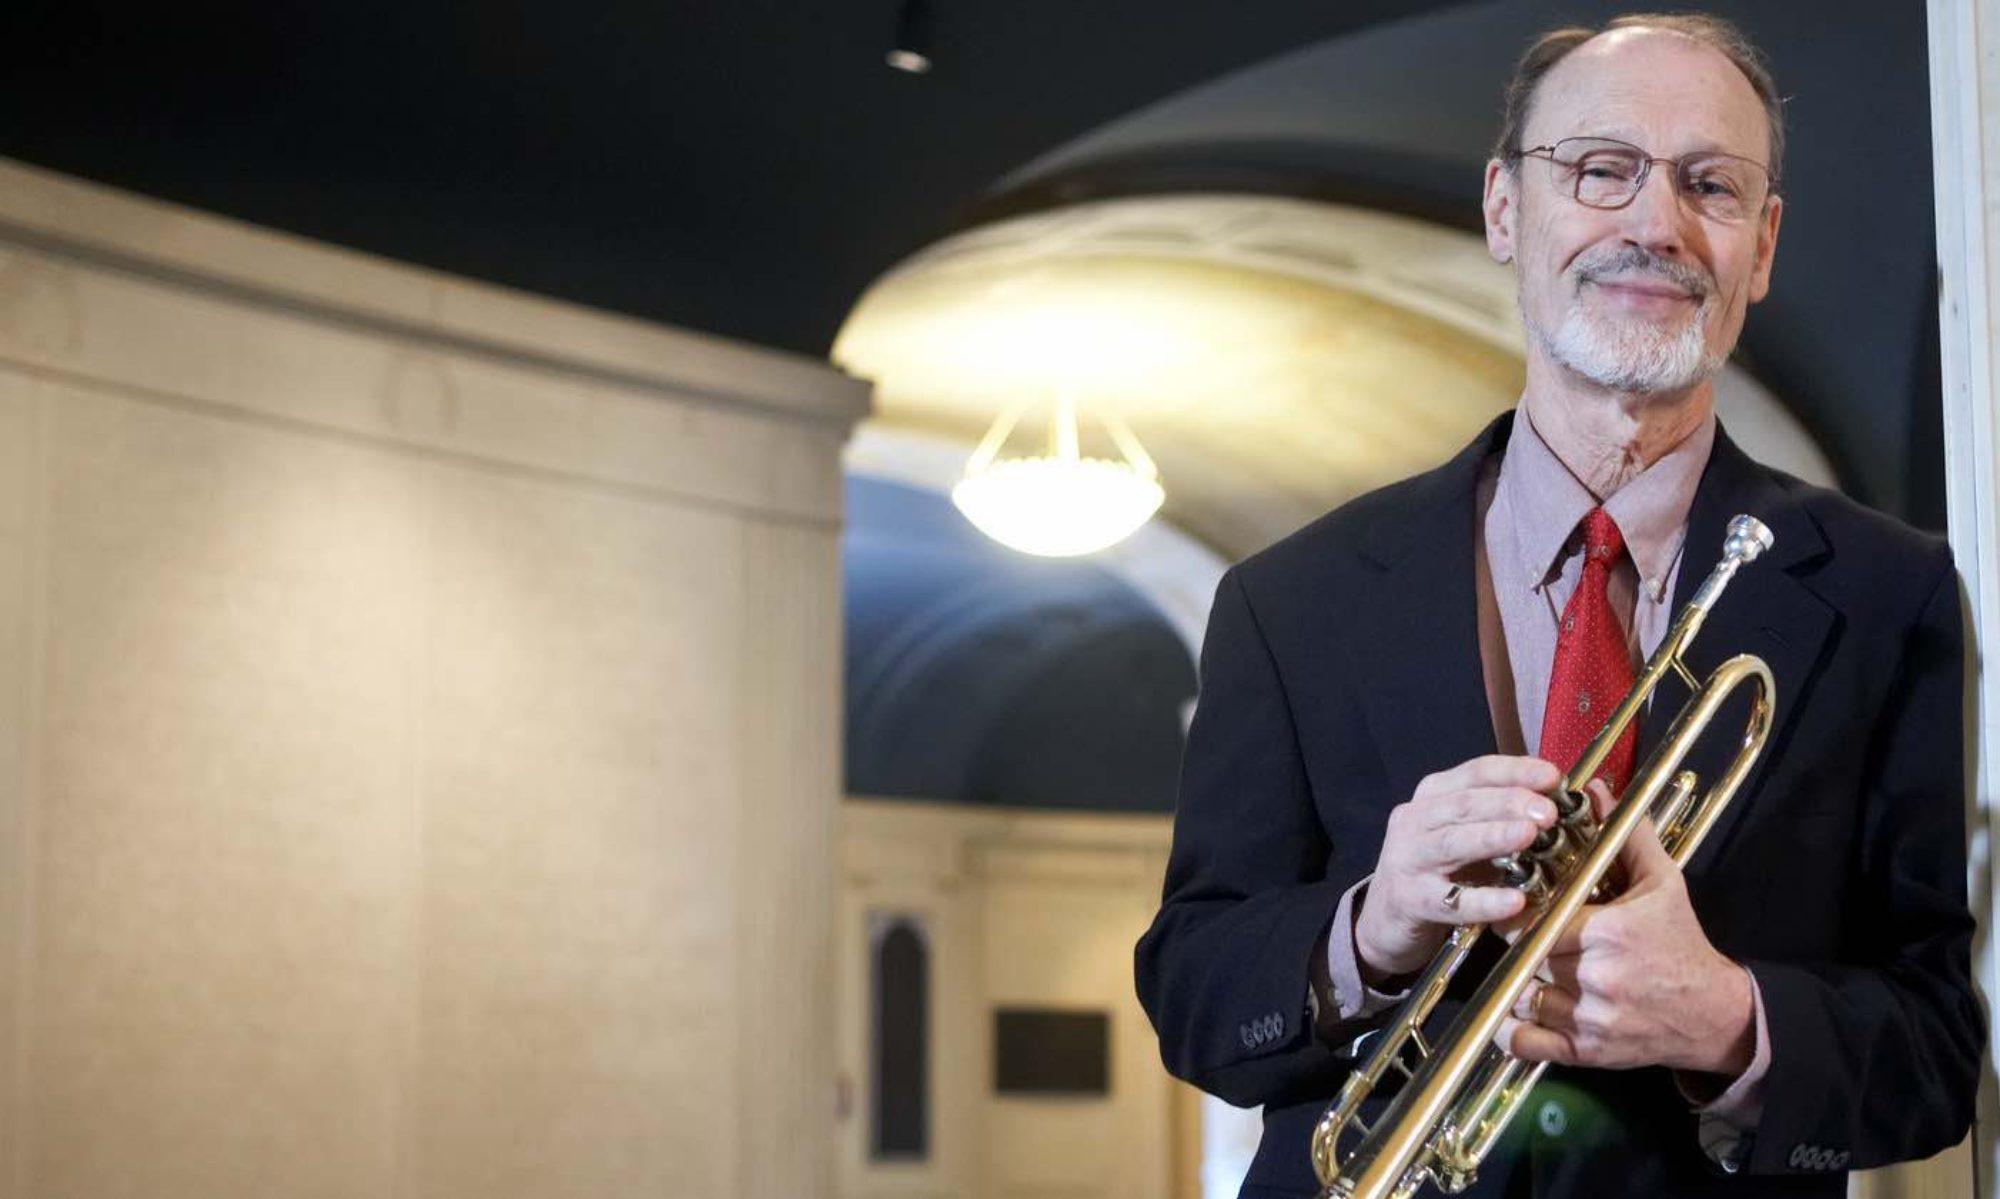 Allan Dean, trumpet